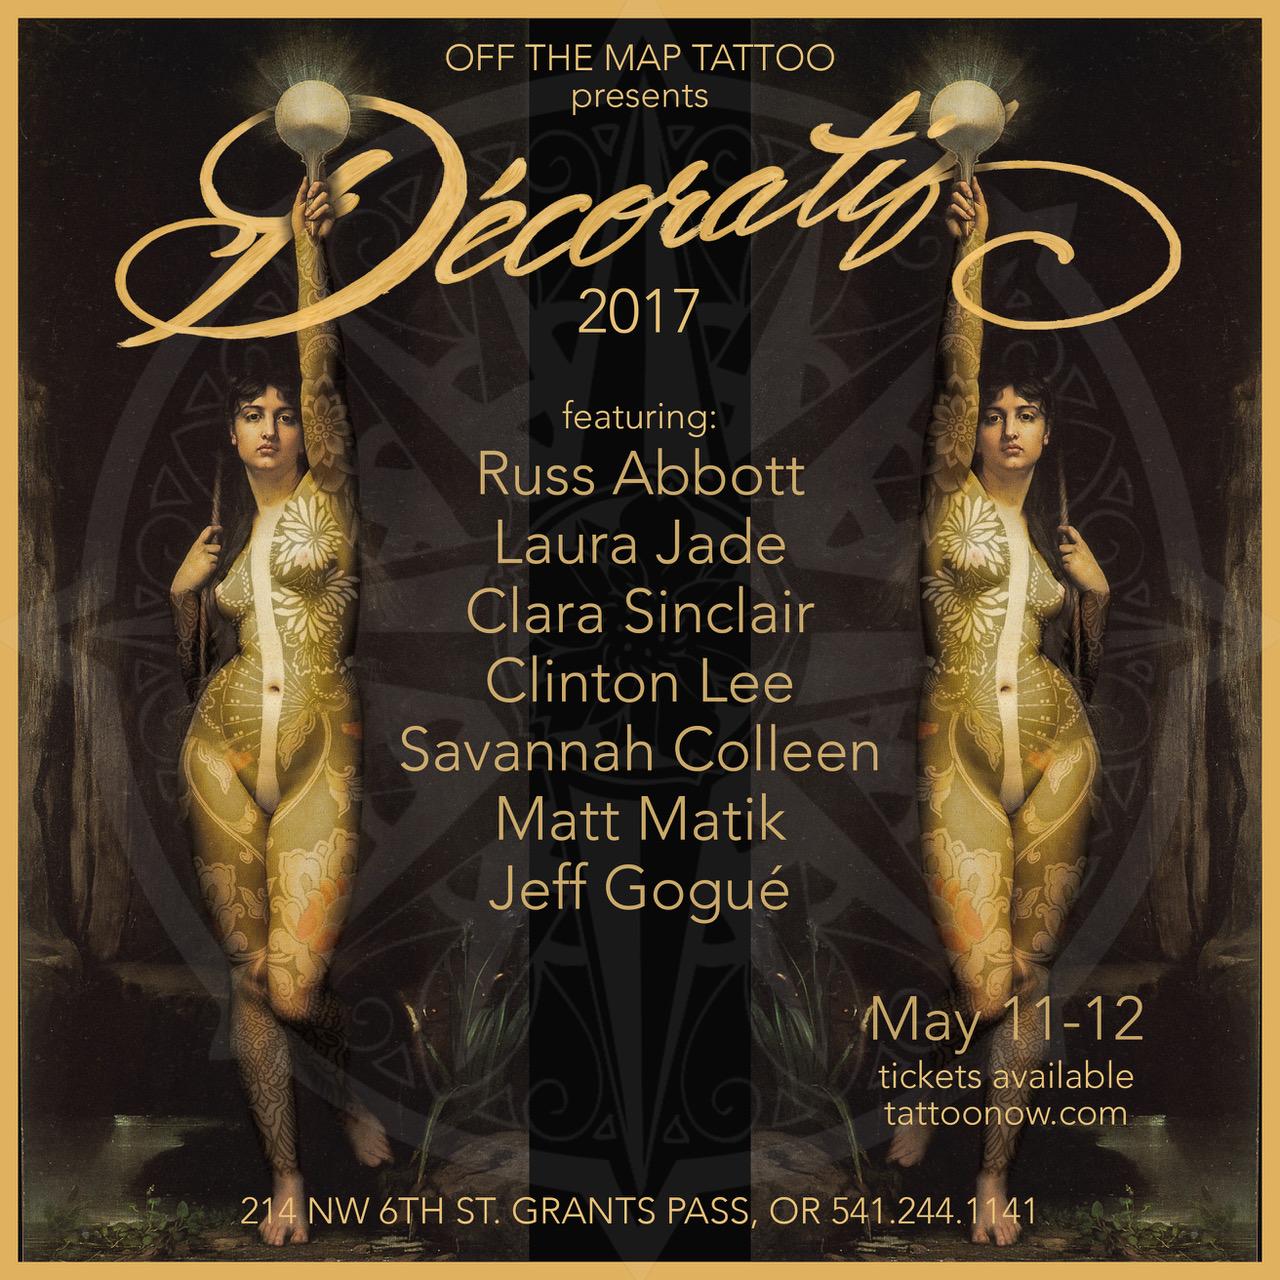 Decoratif Webcast THURS. MAY 11